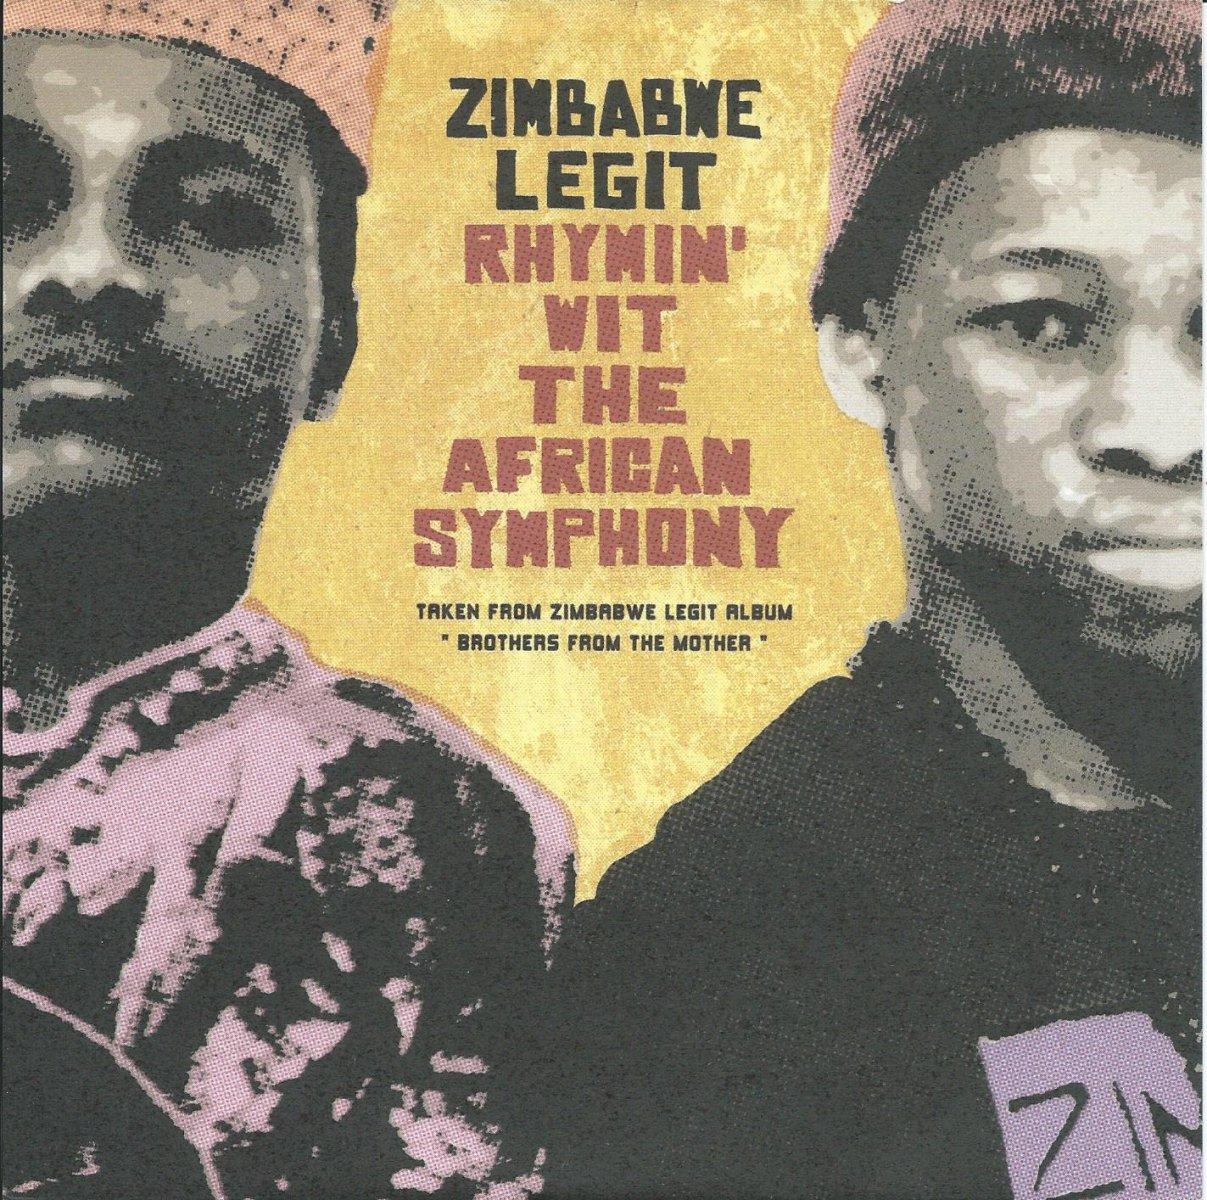 ZIMBABWE LEGIT / RHYMIN' WIT THE AFRICAN SYMPHONY / SIYABONGA (7